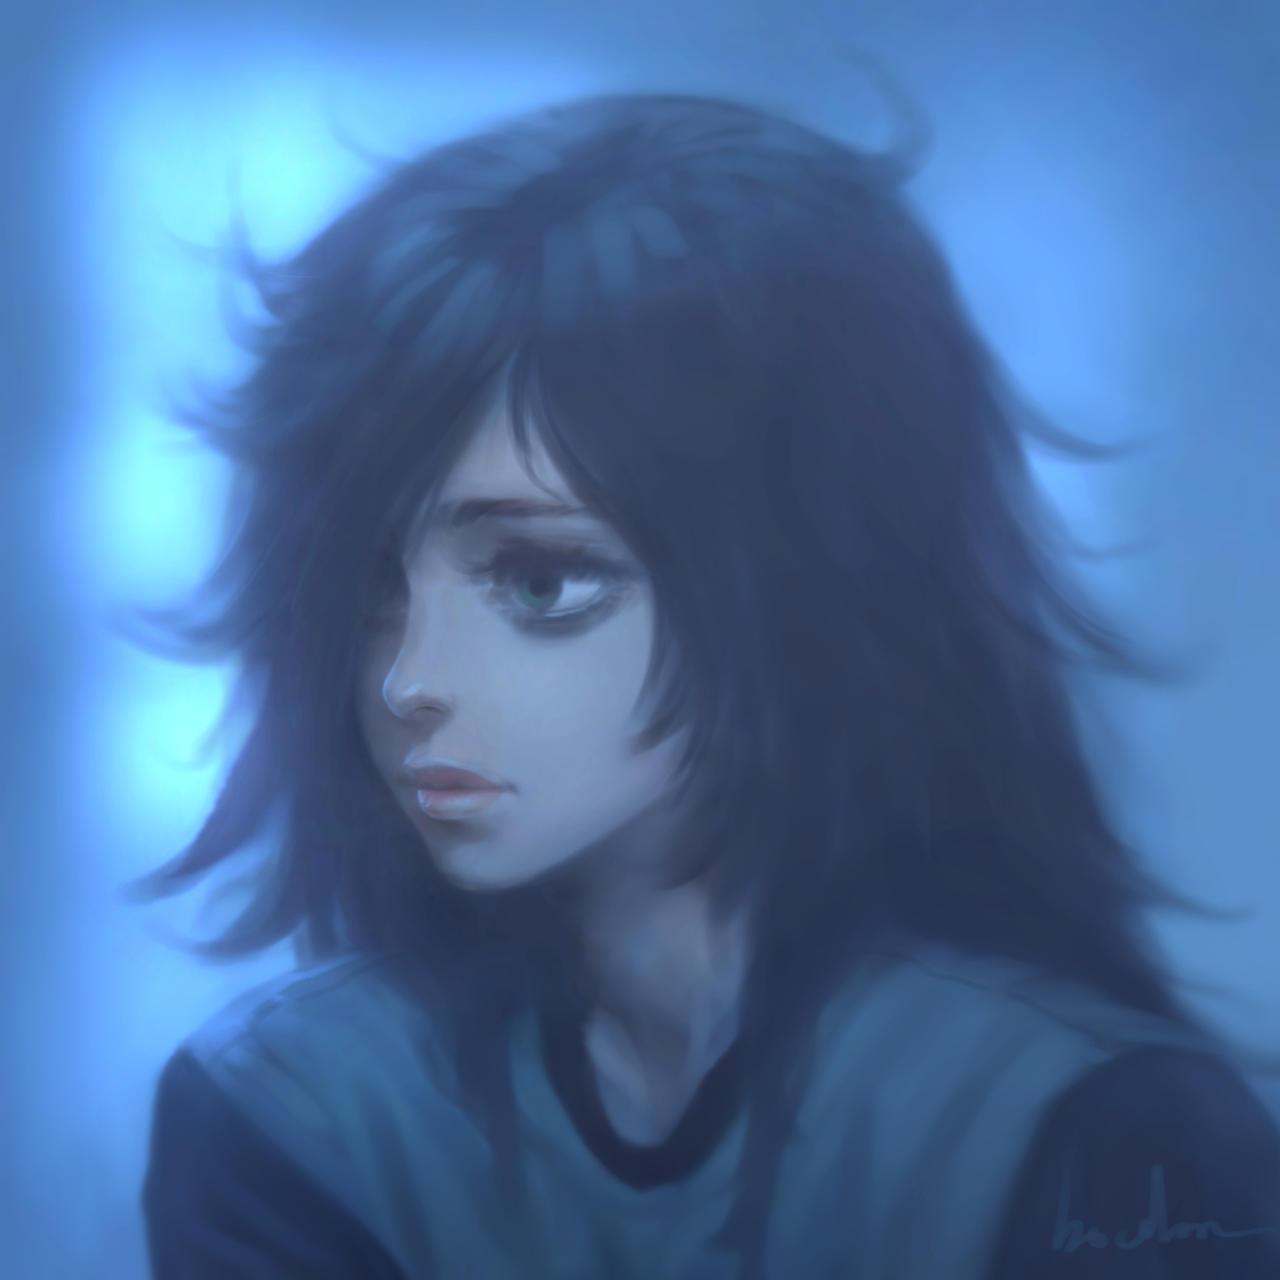 Tomoko 04 by Apegrixs